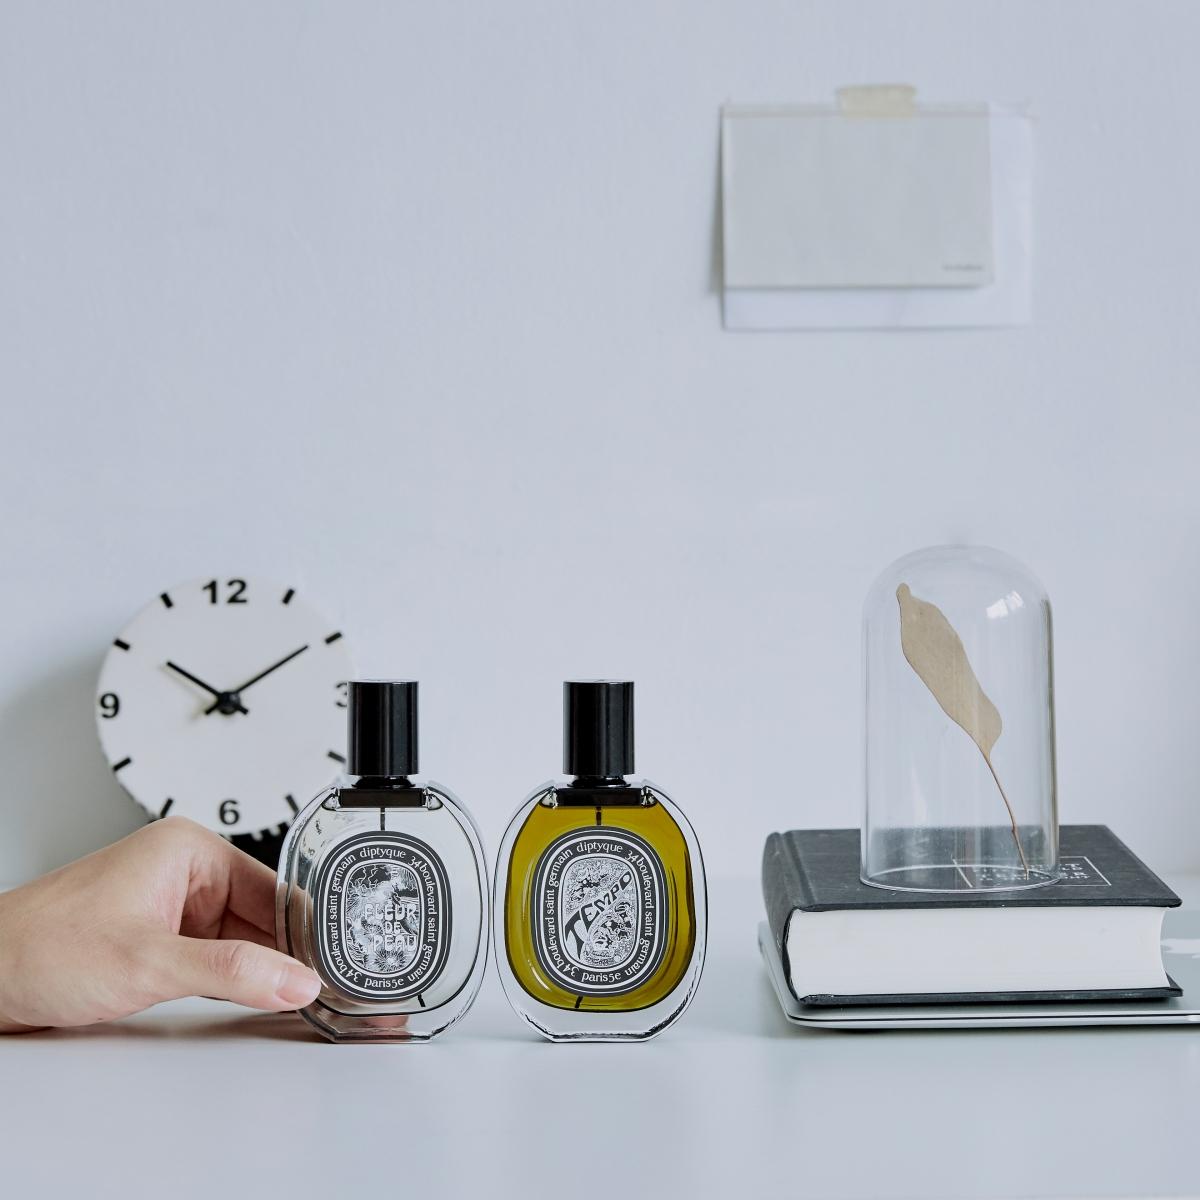 diptyque 同時推出Tempo坦博跟Fleur de Peau肌膚之華淡香精,選擇困難症必須發作